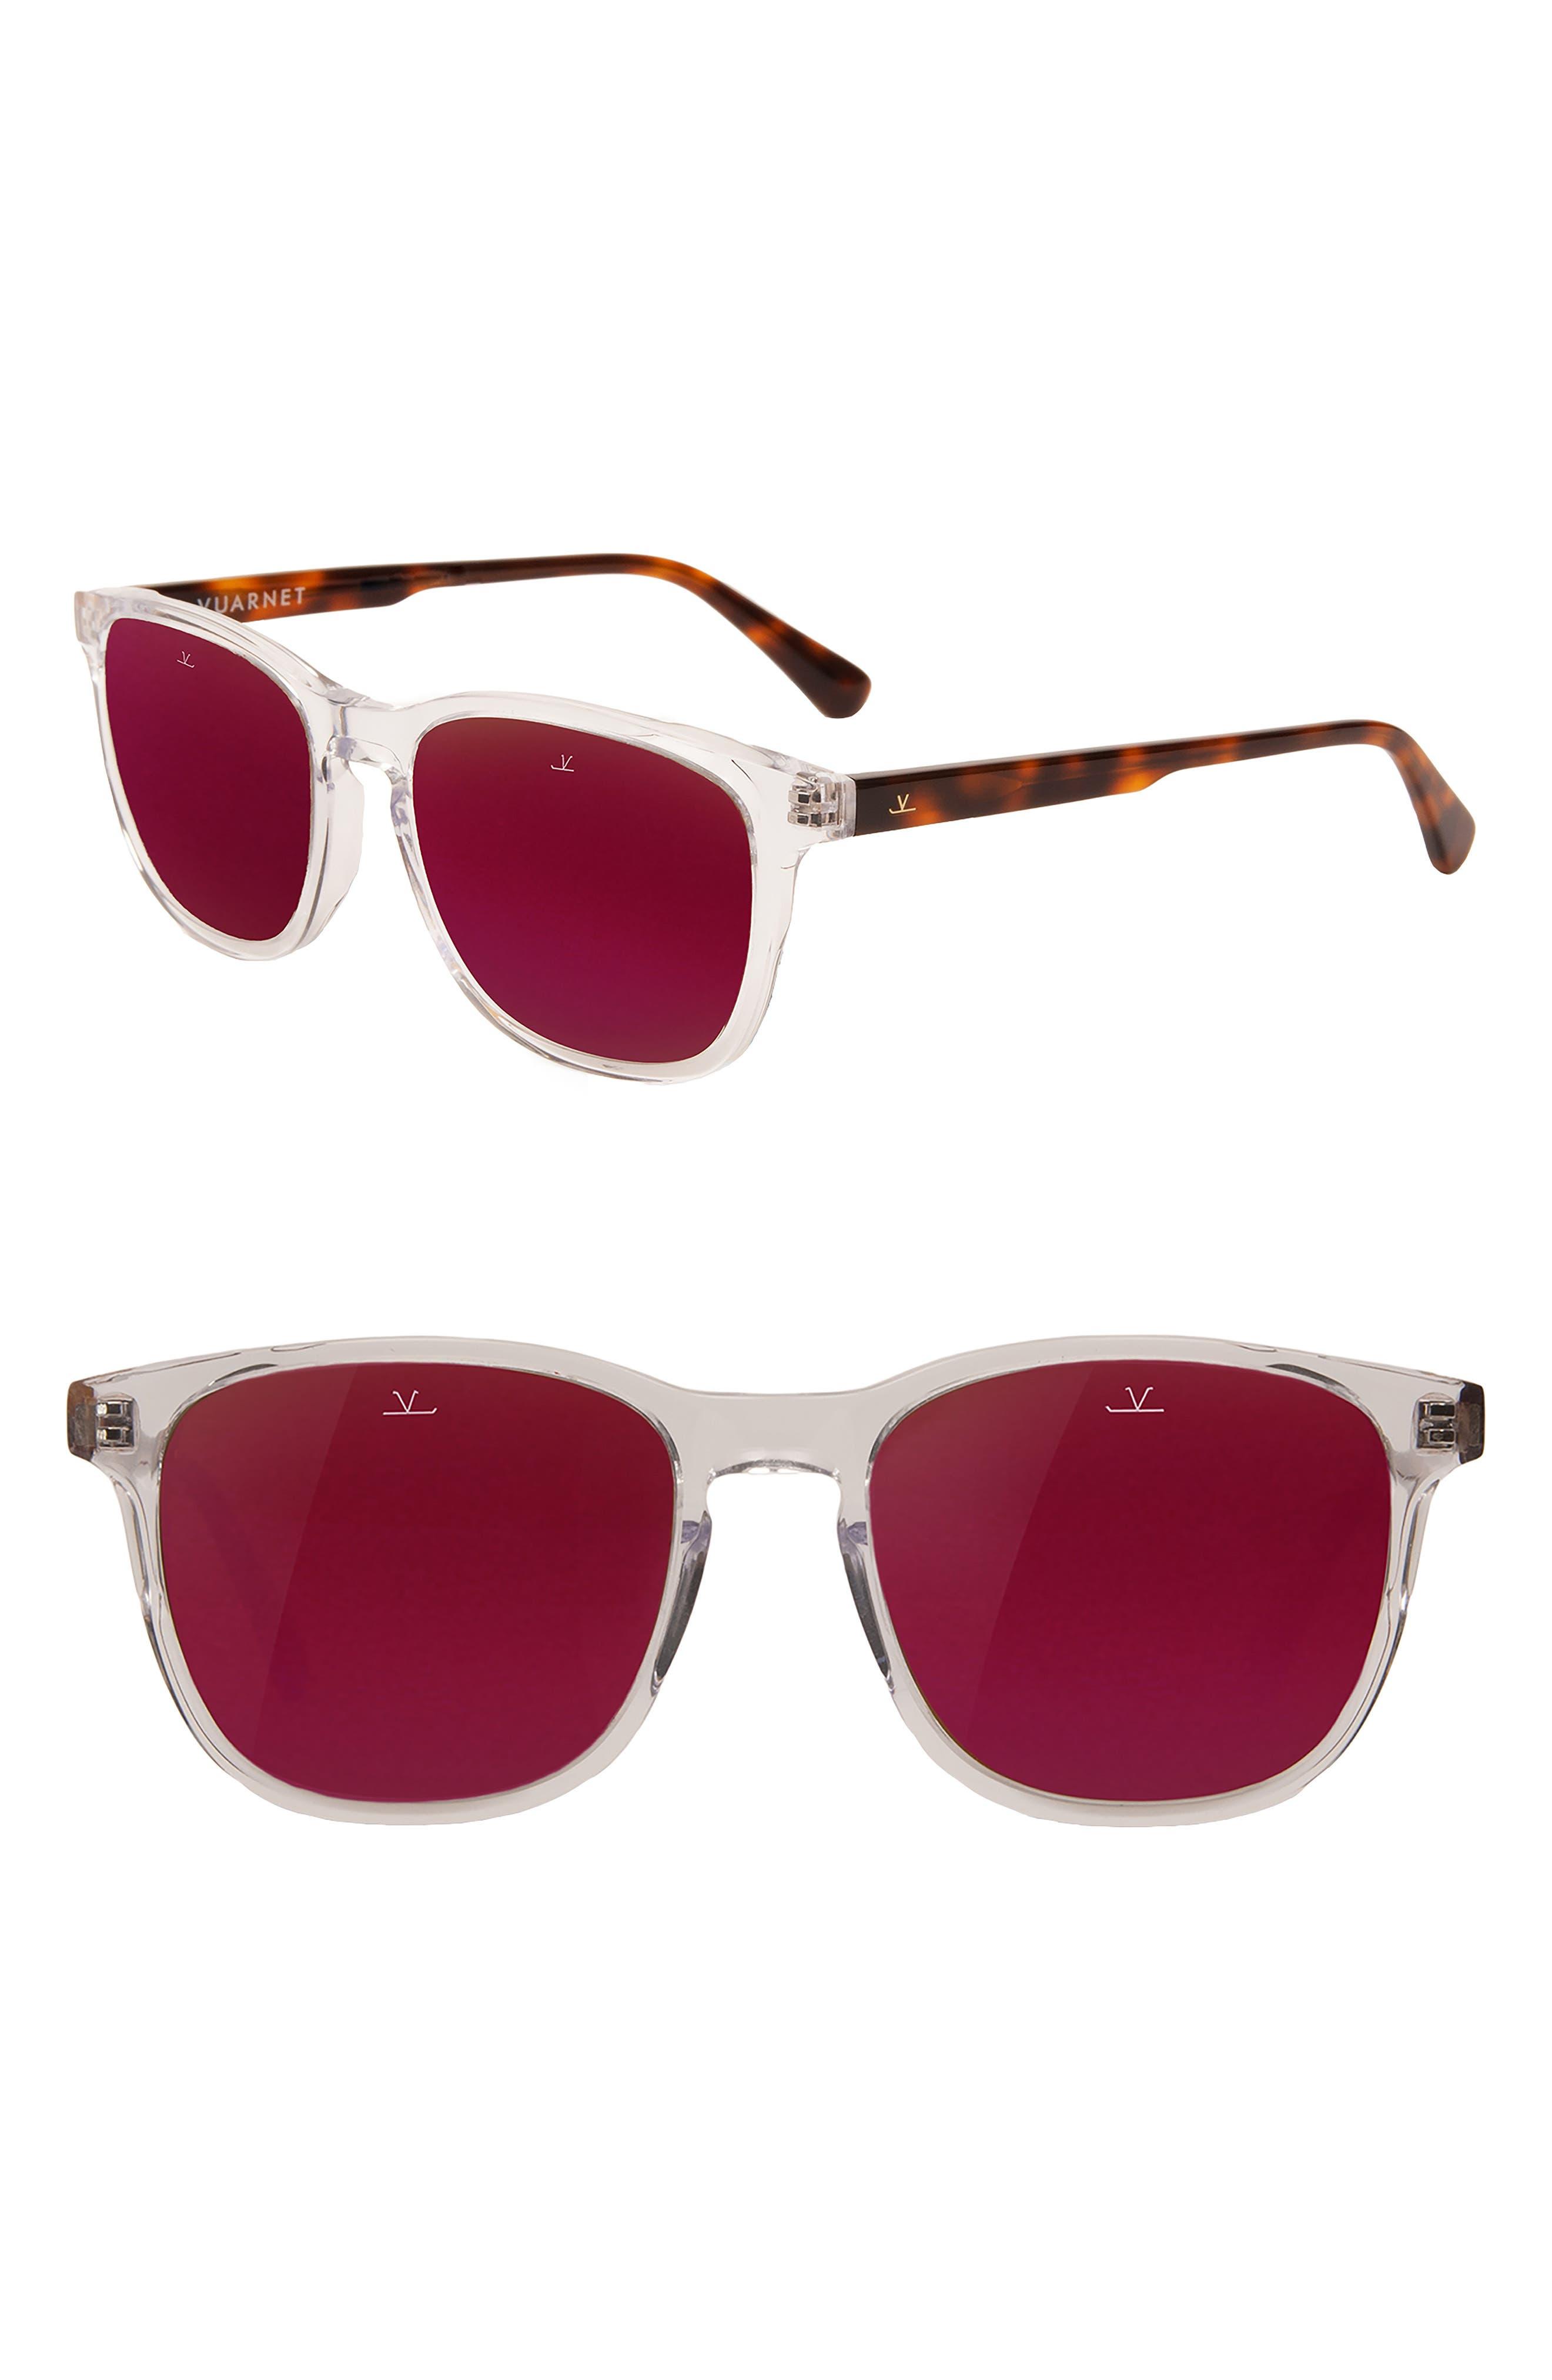 District Medium 53mm Sunglasses,                             Main thumbnail 1, color,                             UNILYNX PURPLE FLASH